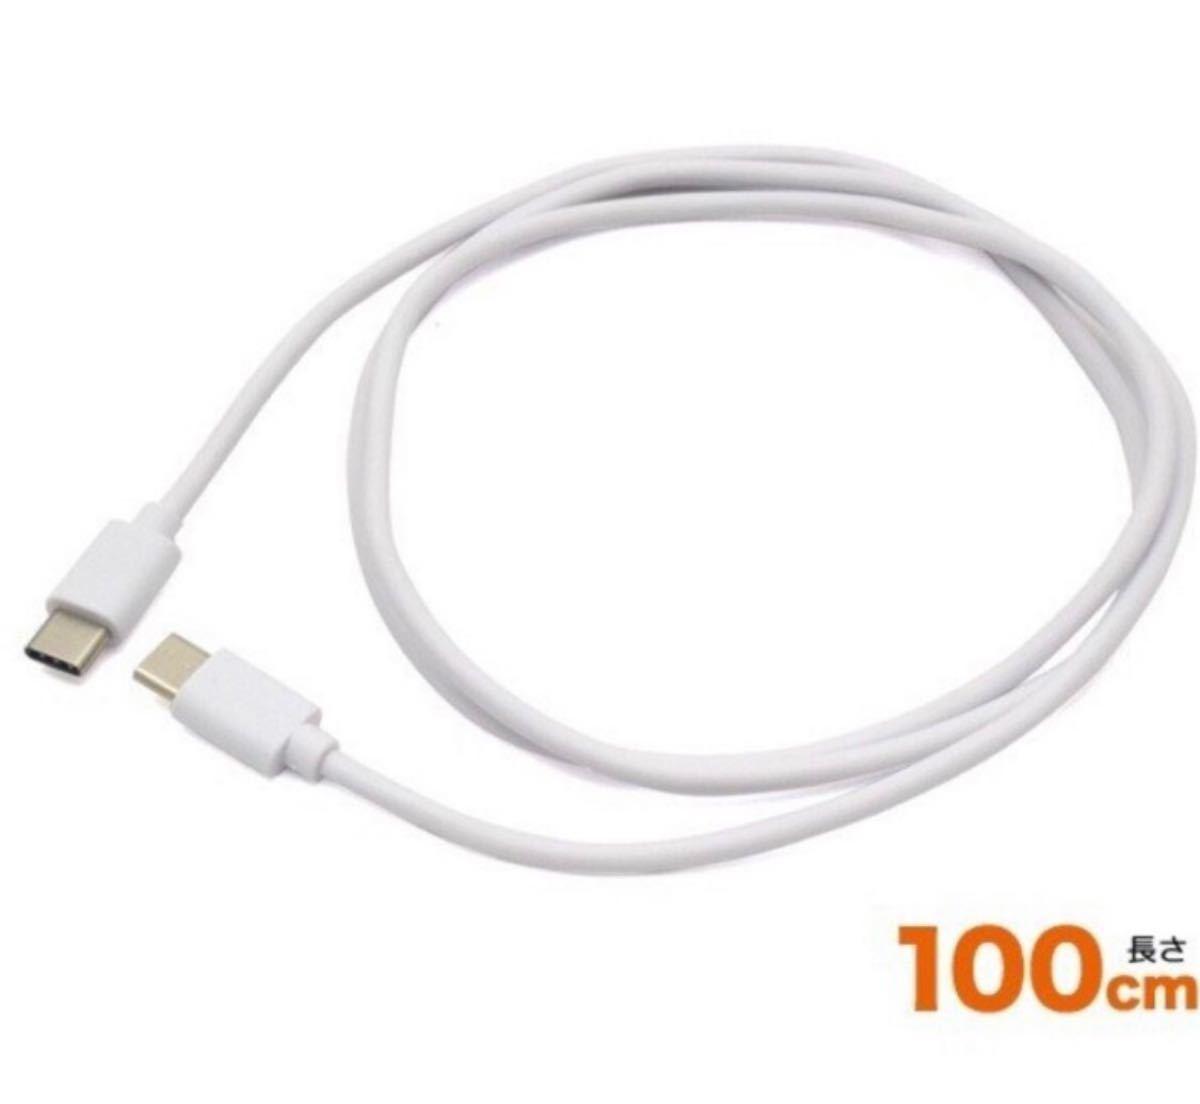 (週末限定価格) USB Type-C to Type-C ケーブル 急速充電対応 1本1M 急速充電 充電ケーブル USB-C